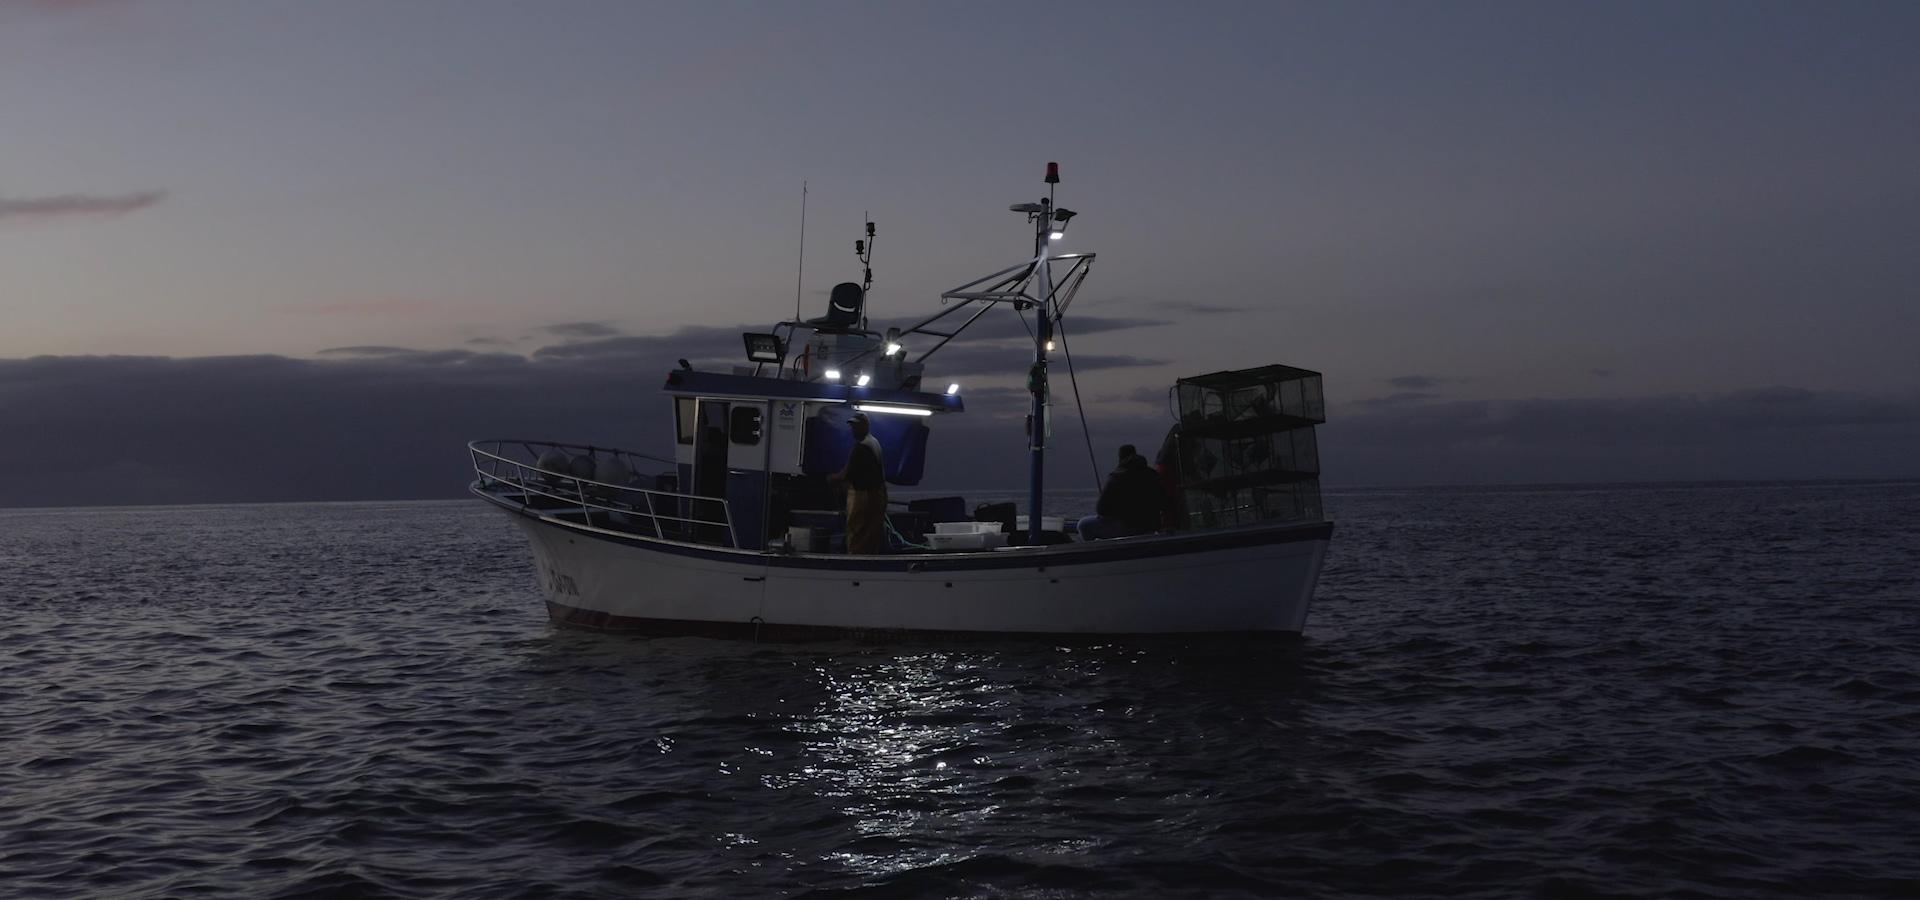 Barco de pesca artesanal de Tenerife